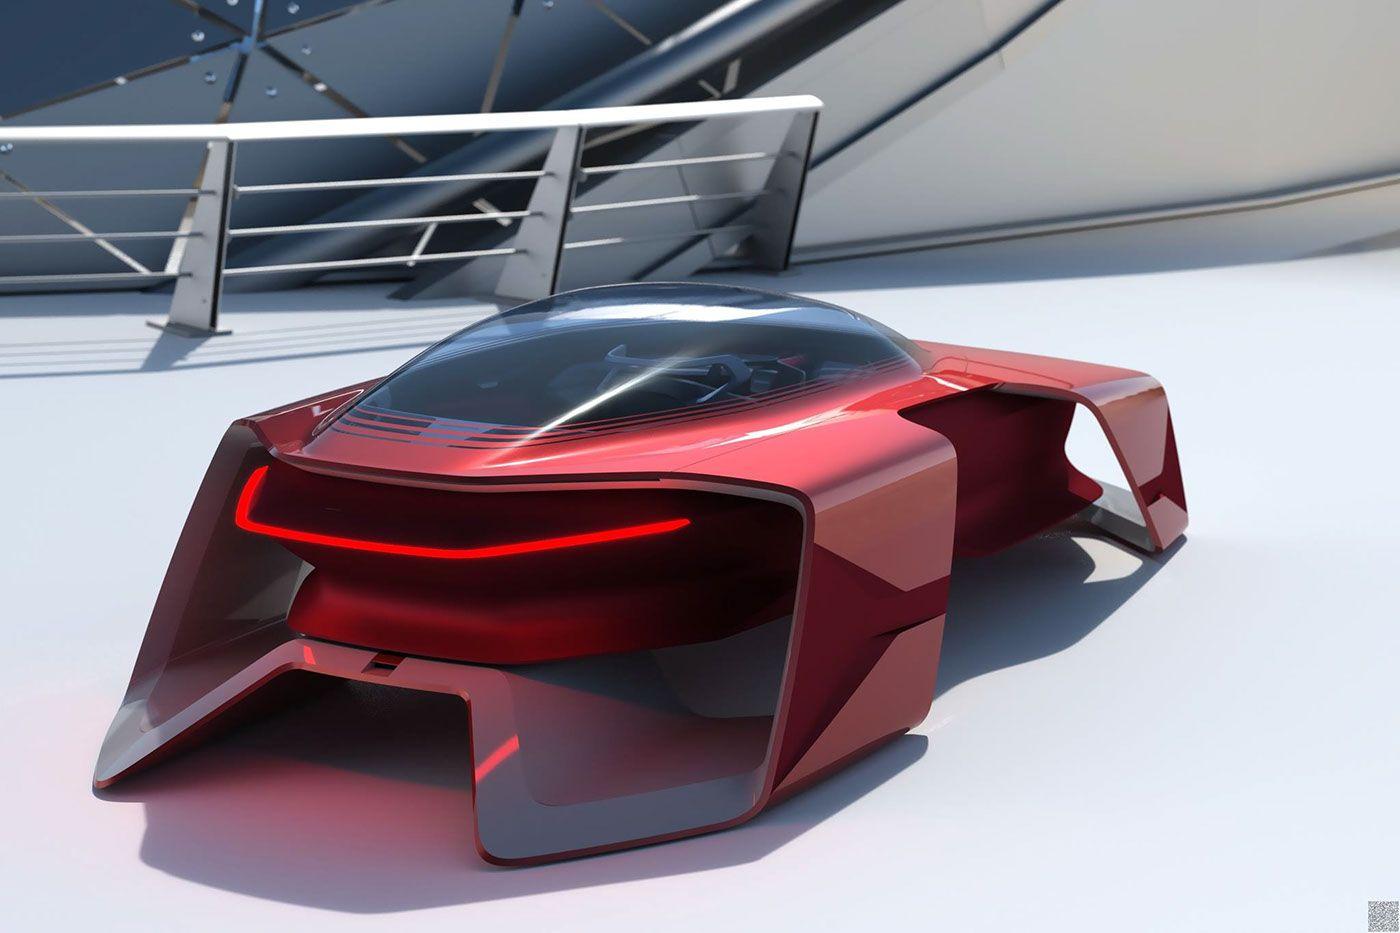 Dacia Ef Vision 2050 By Florina Cristina Enciu Motivezine Concept Car Design Concept Cars Dacia